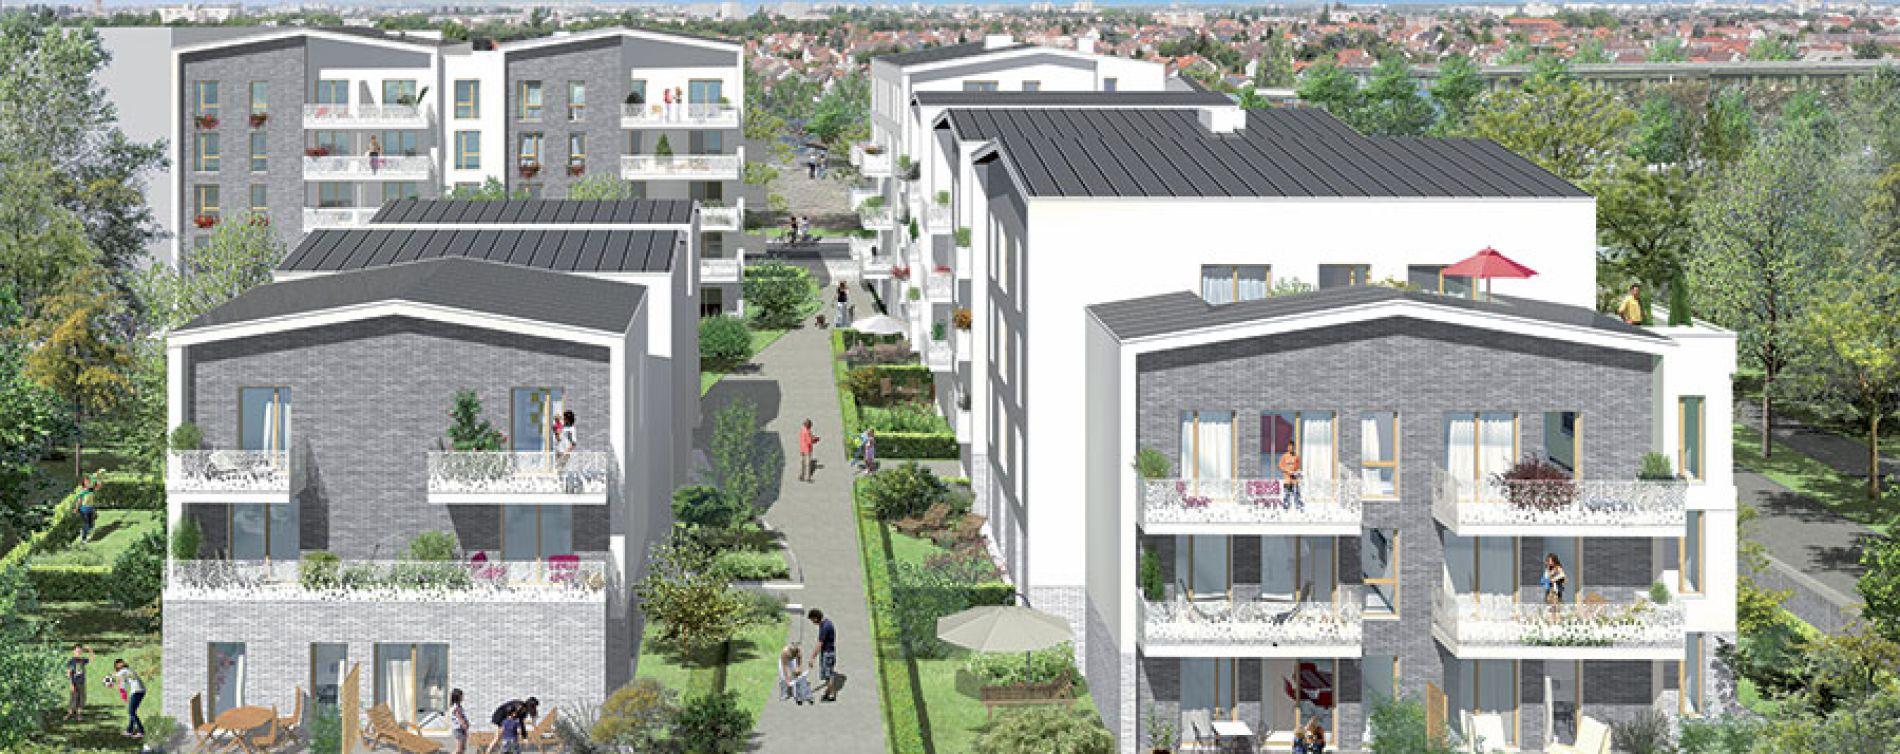 Villepinte : programme immobilier neuve « Orig'In » (2)